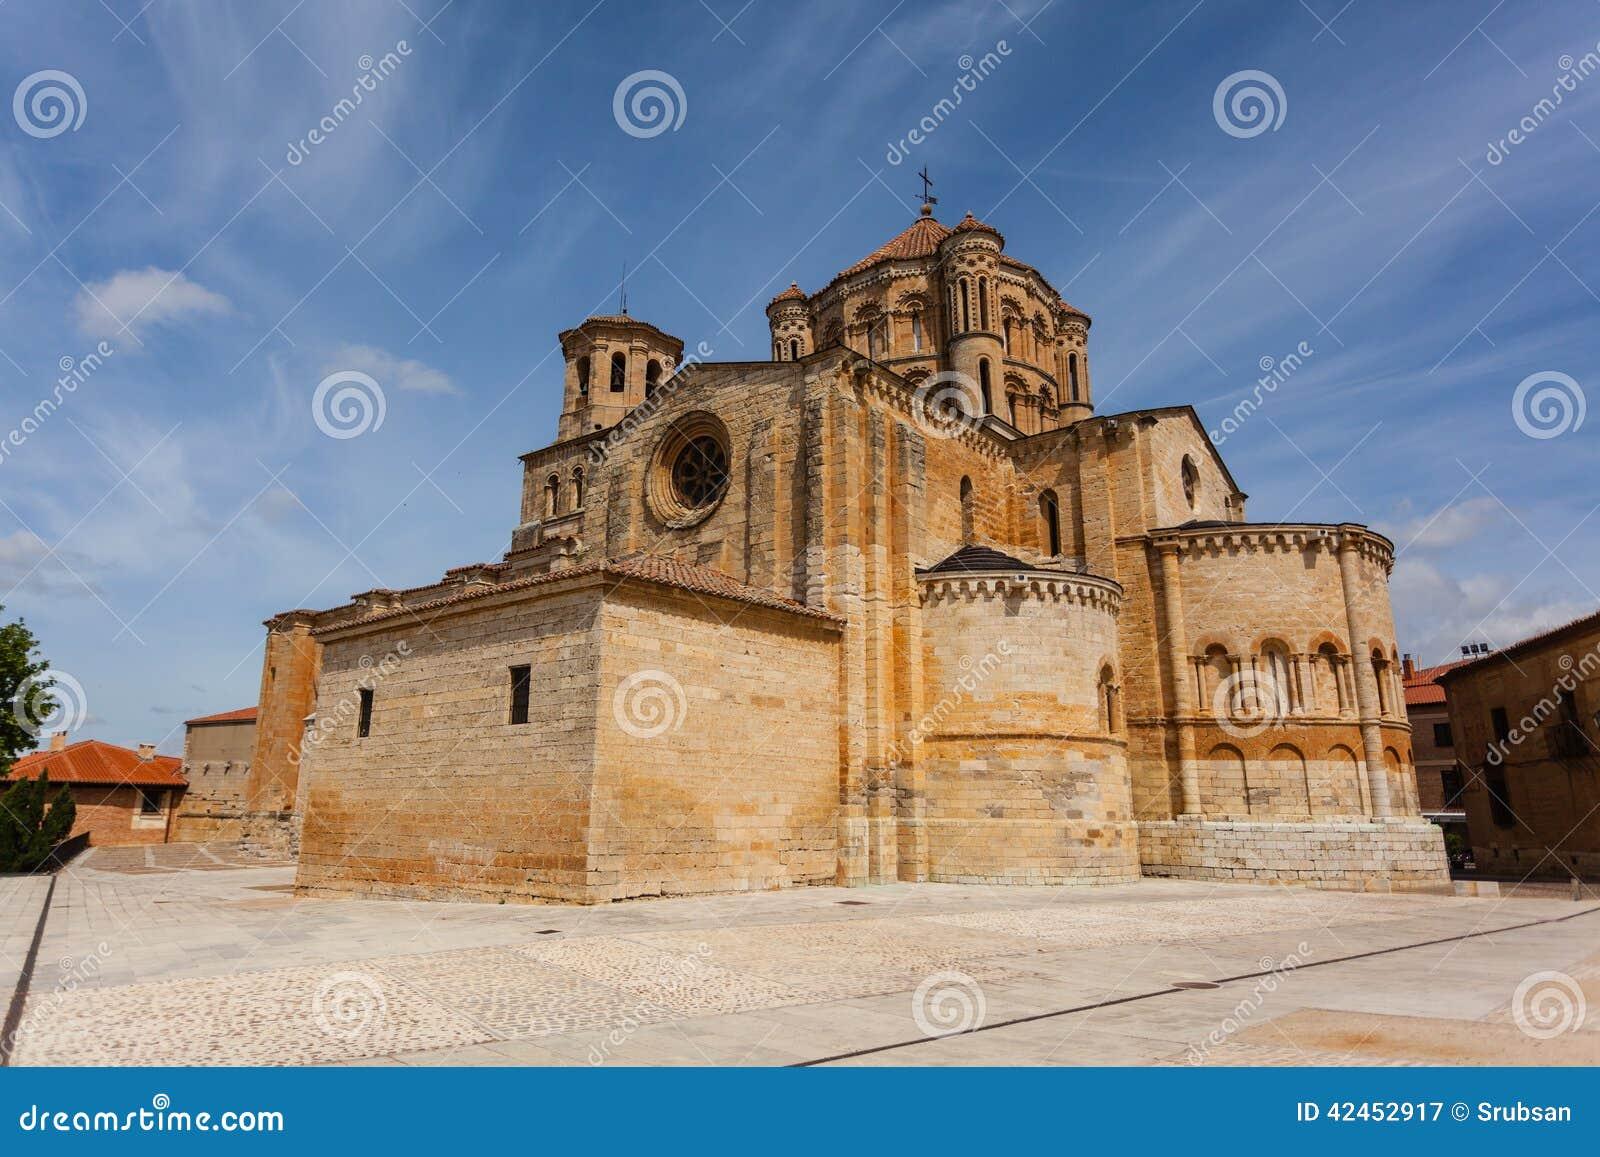 Voll- Ansicht der Toro-Romanesquecollegekirche